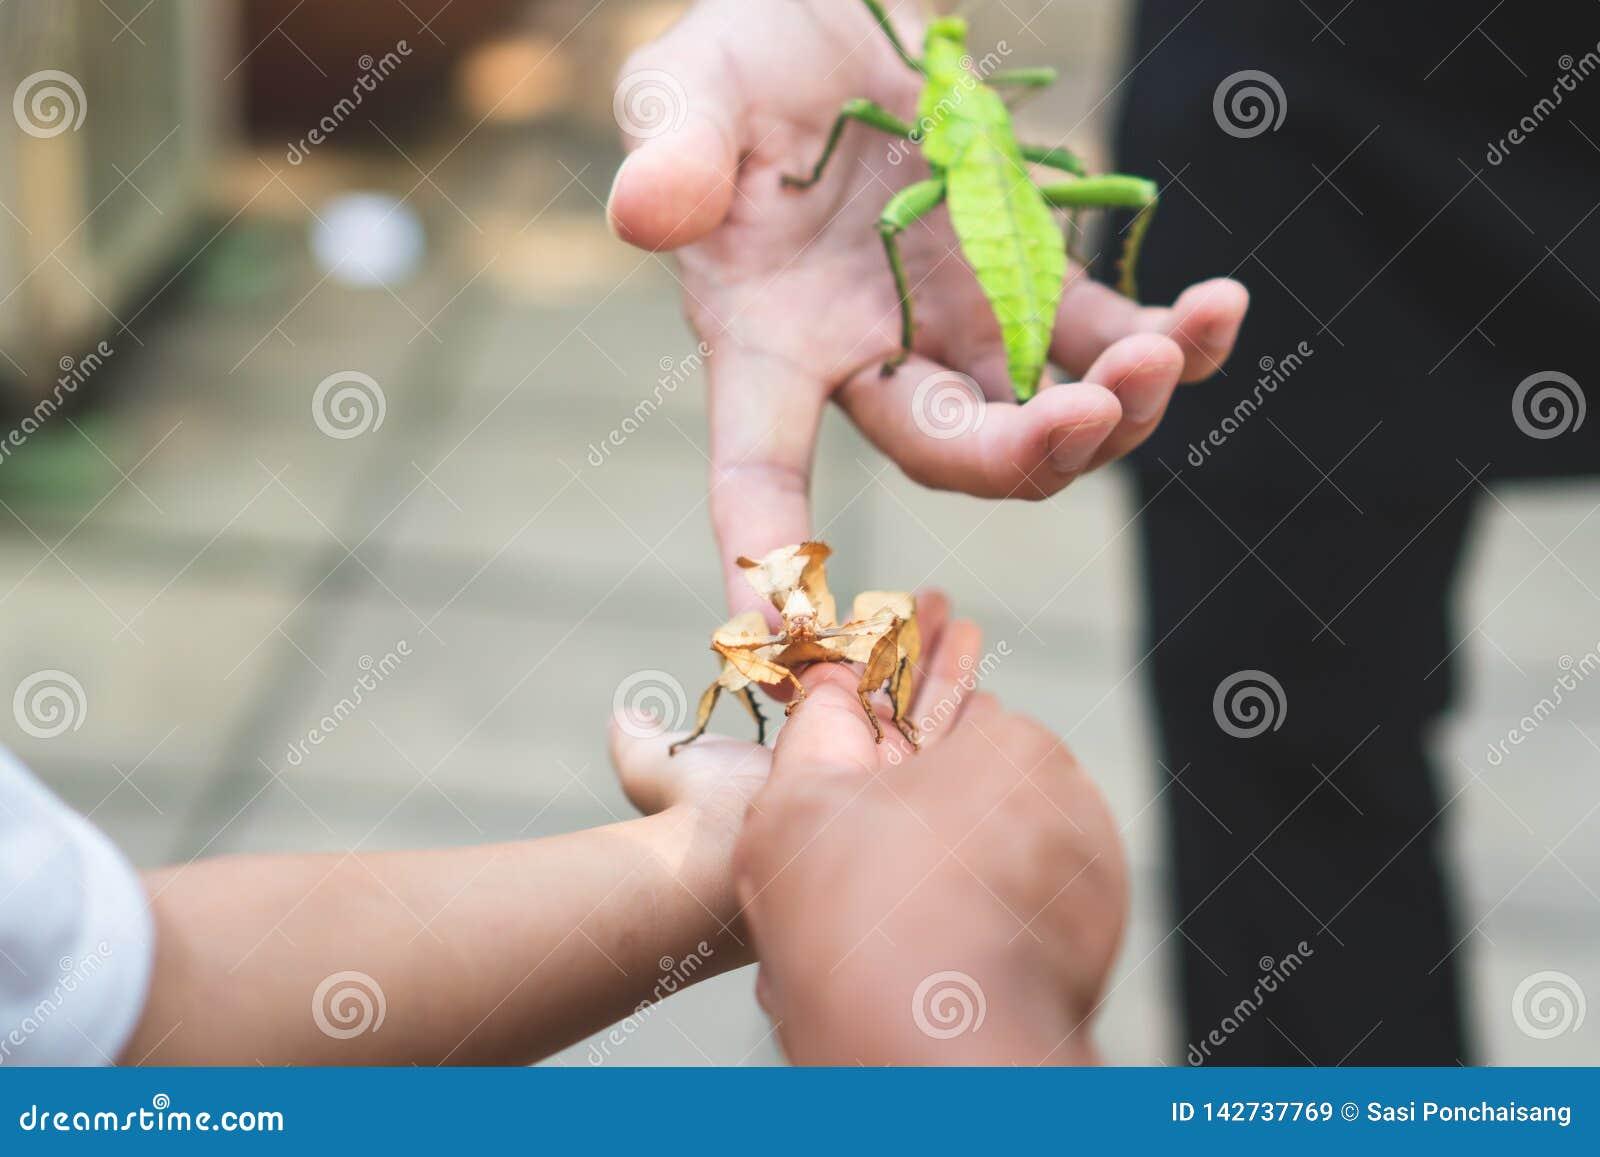 Grasshopper stick on kid and parent hand